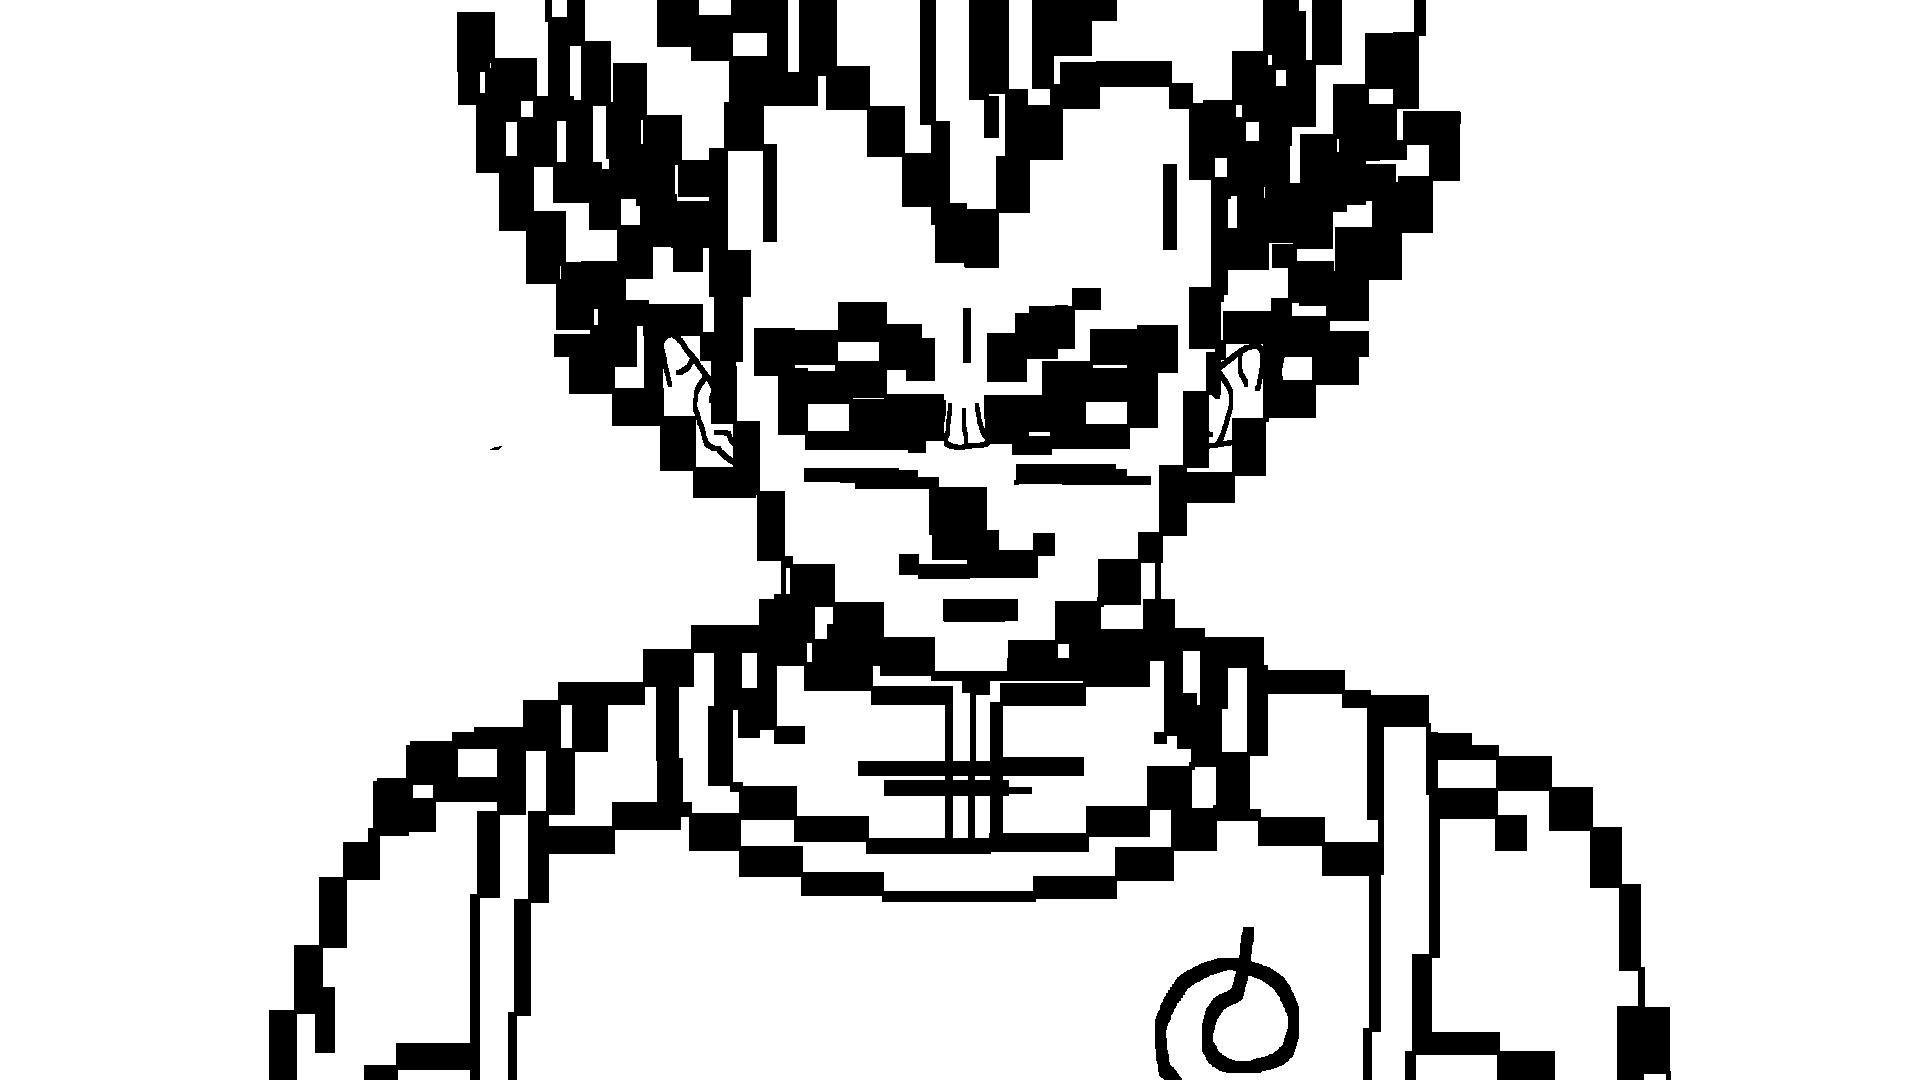 Dragon Ball Z Lineart : Dragon ball z resurrection f vegeta blue lineart by